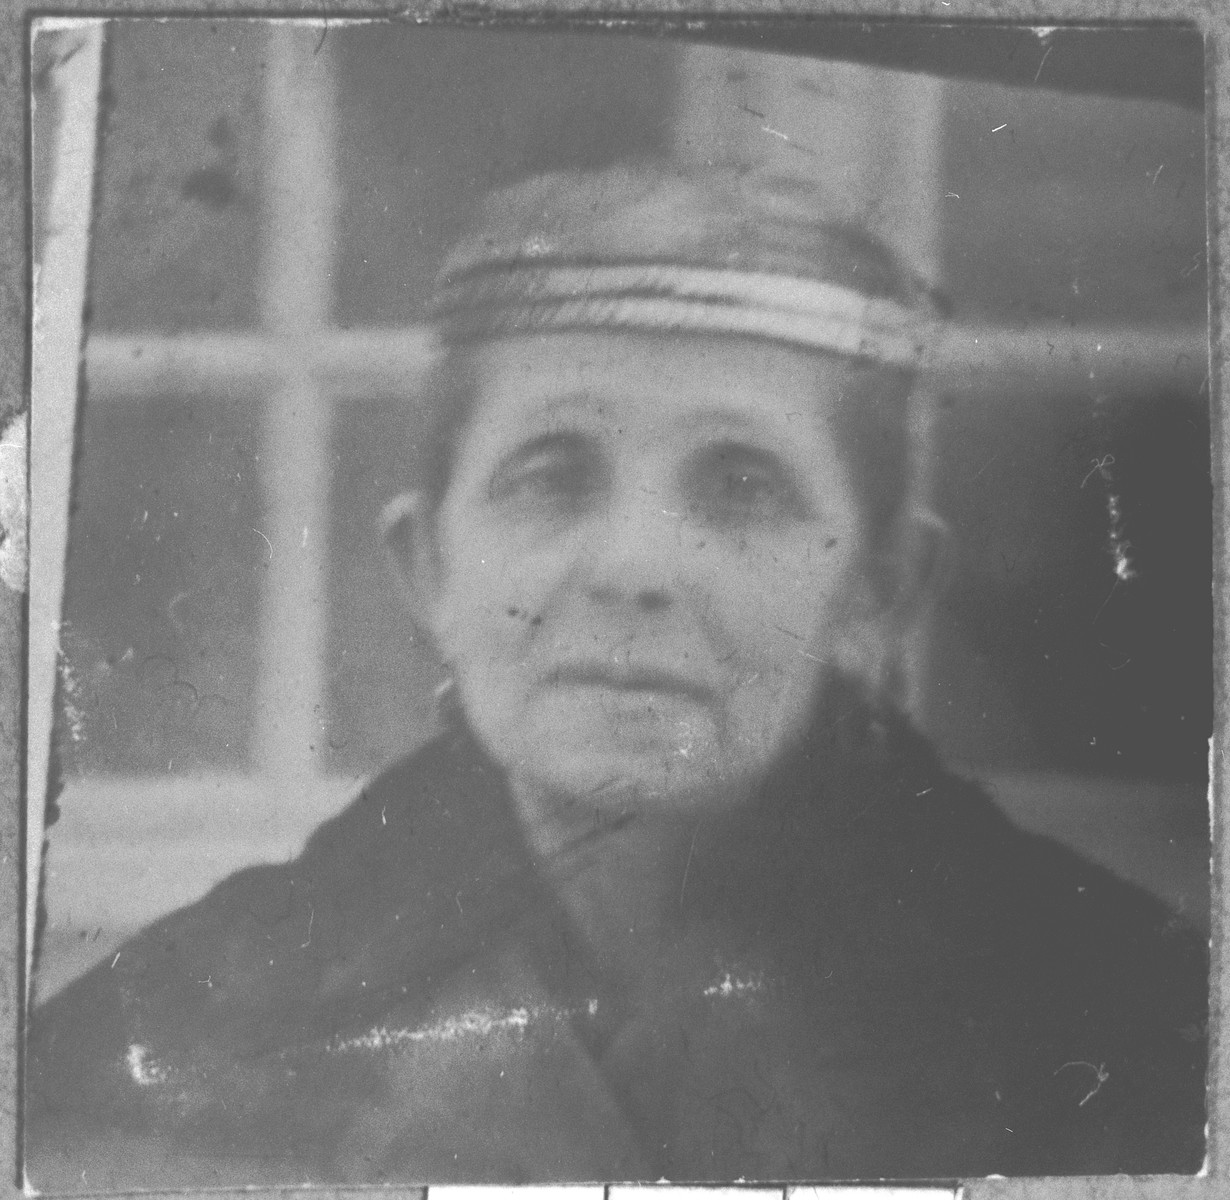 Portrait of Yafa Kalderon.  She lived at Orizarska 9 in Bitola.